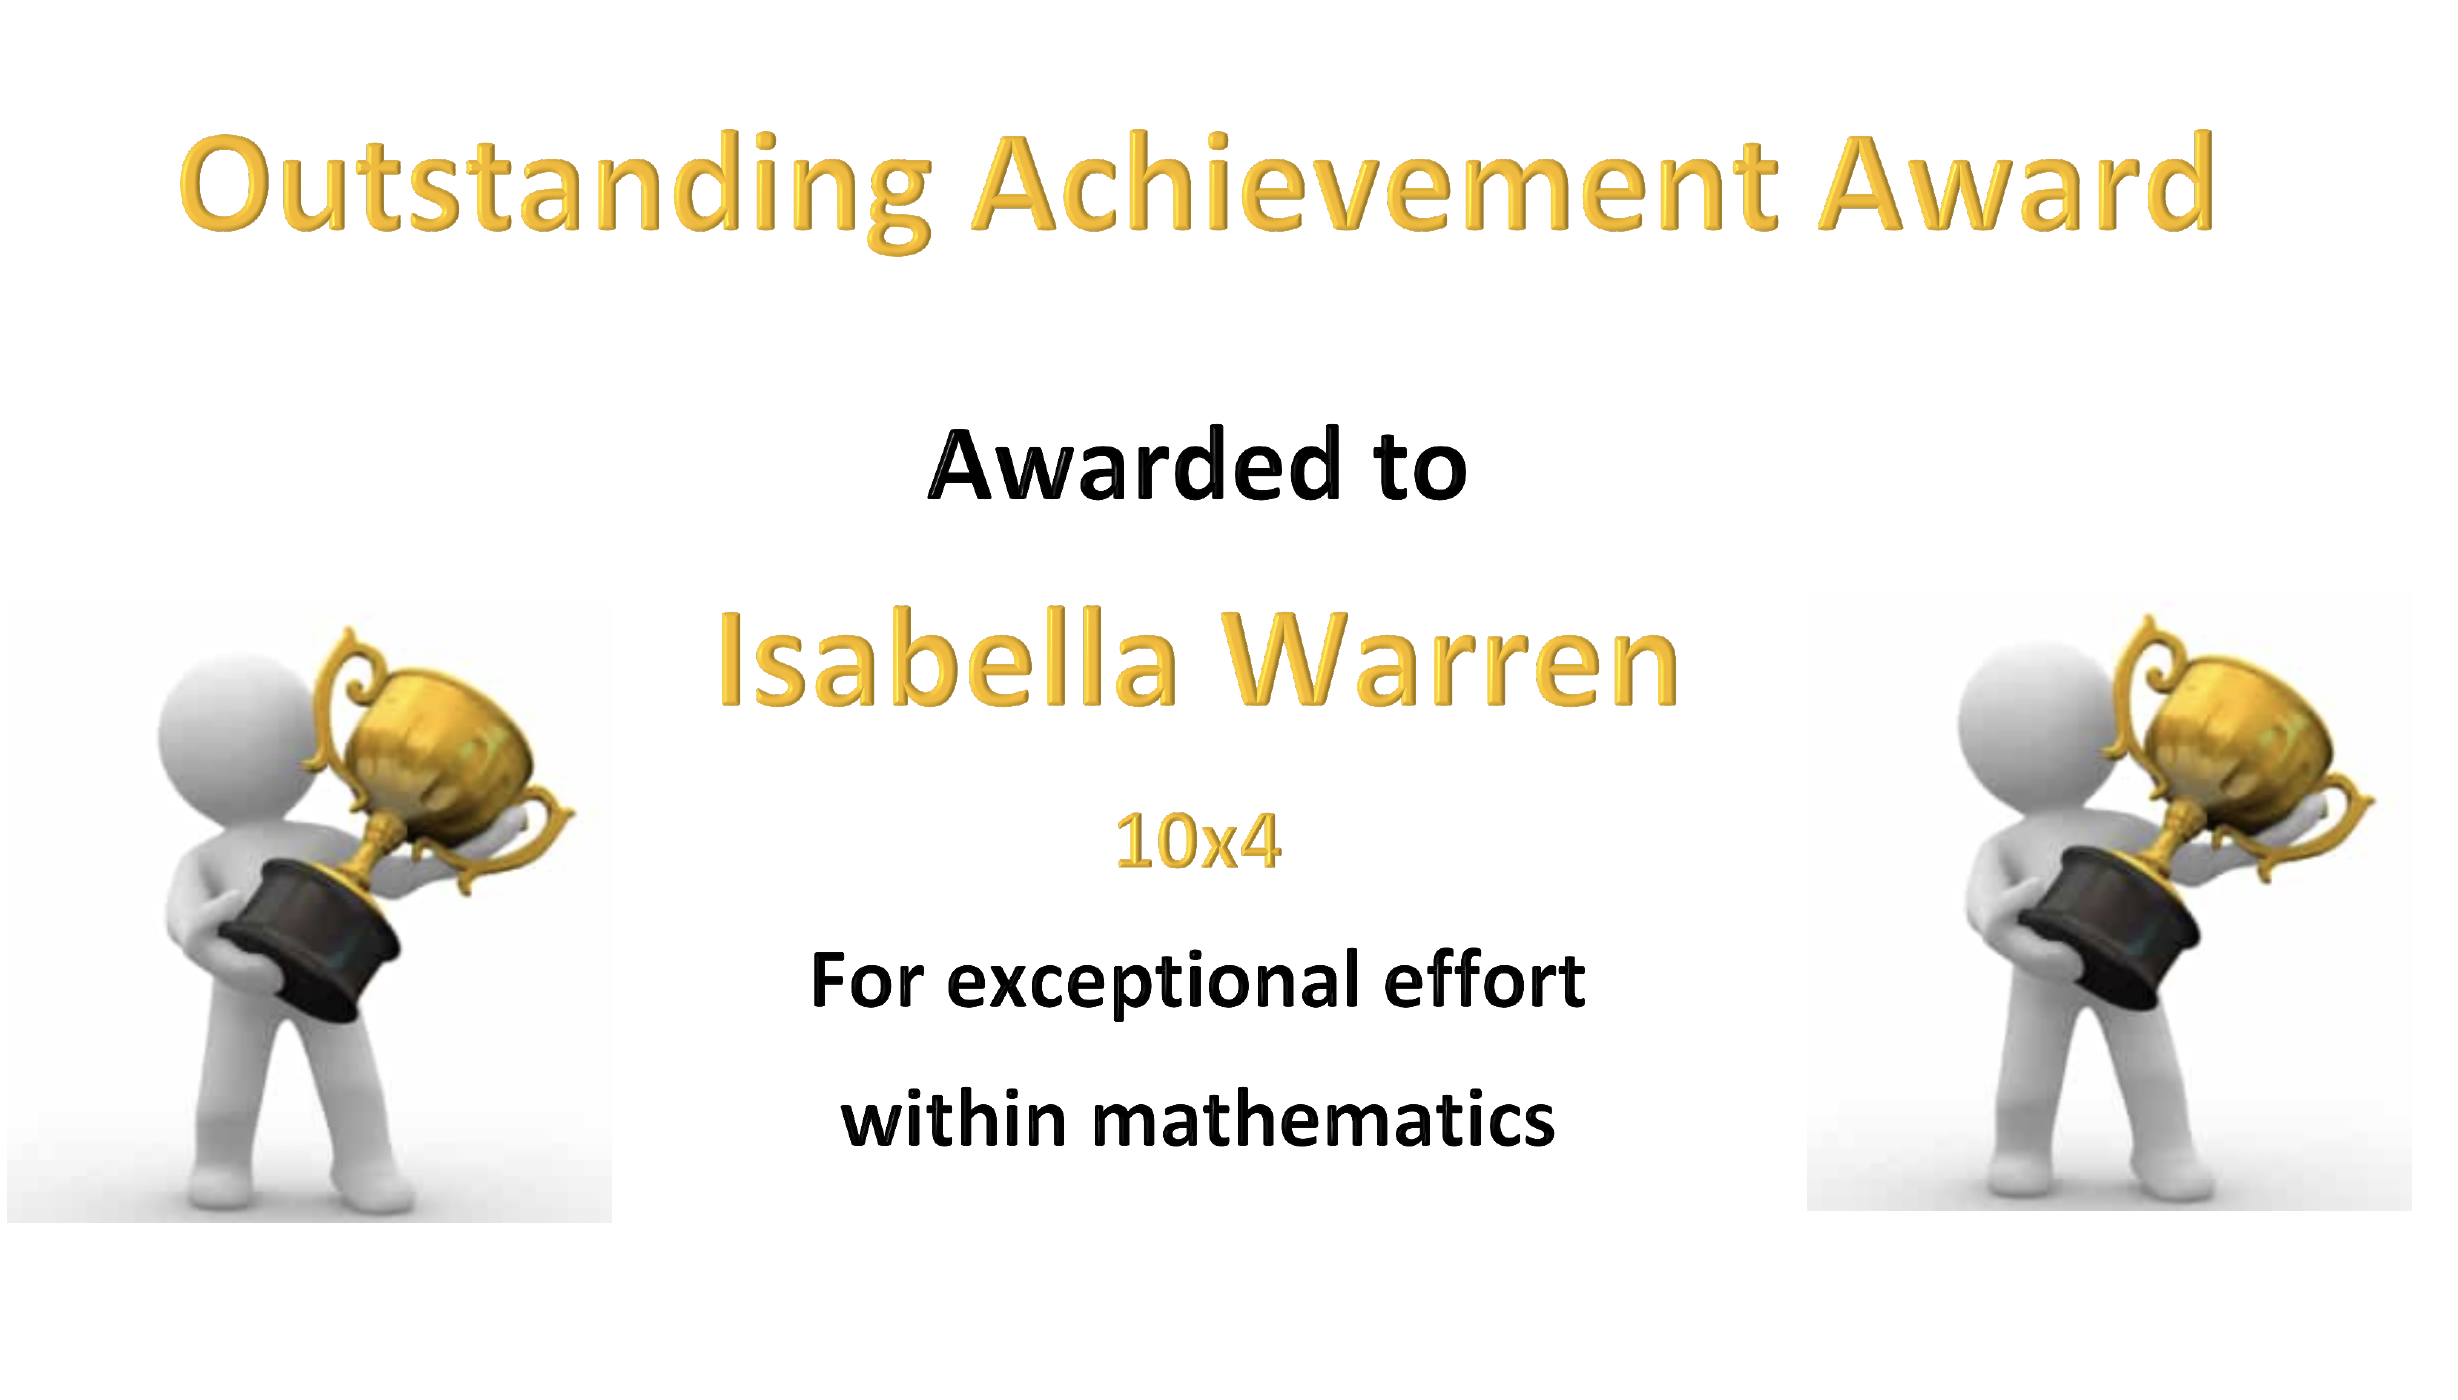 27/04/20 - Outstanding Work by Isabella Warren in Maths